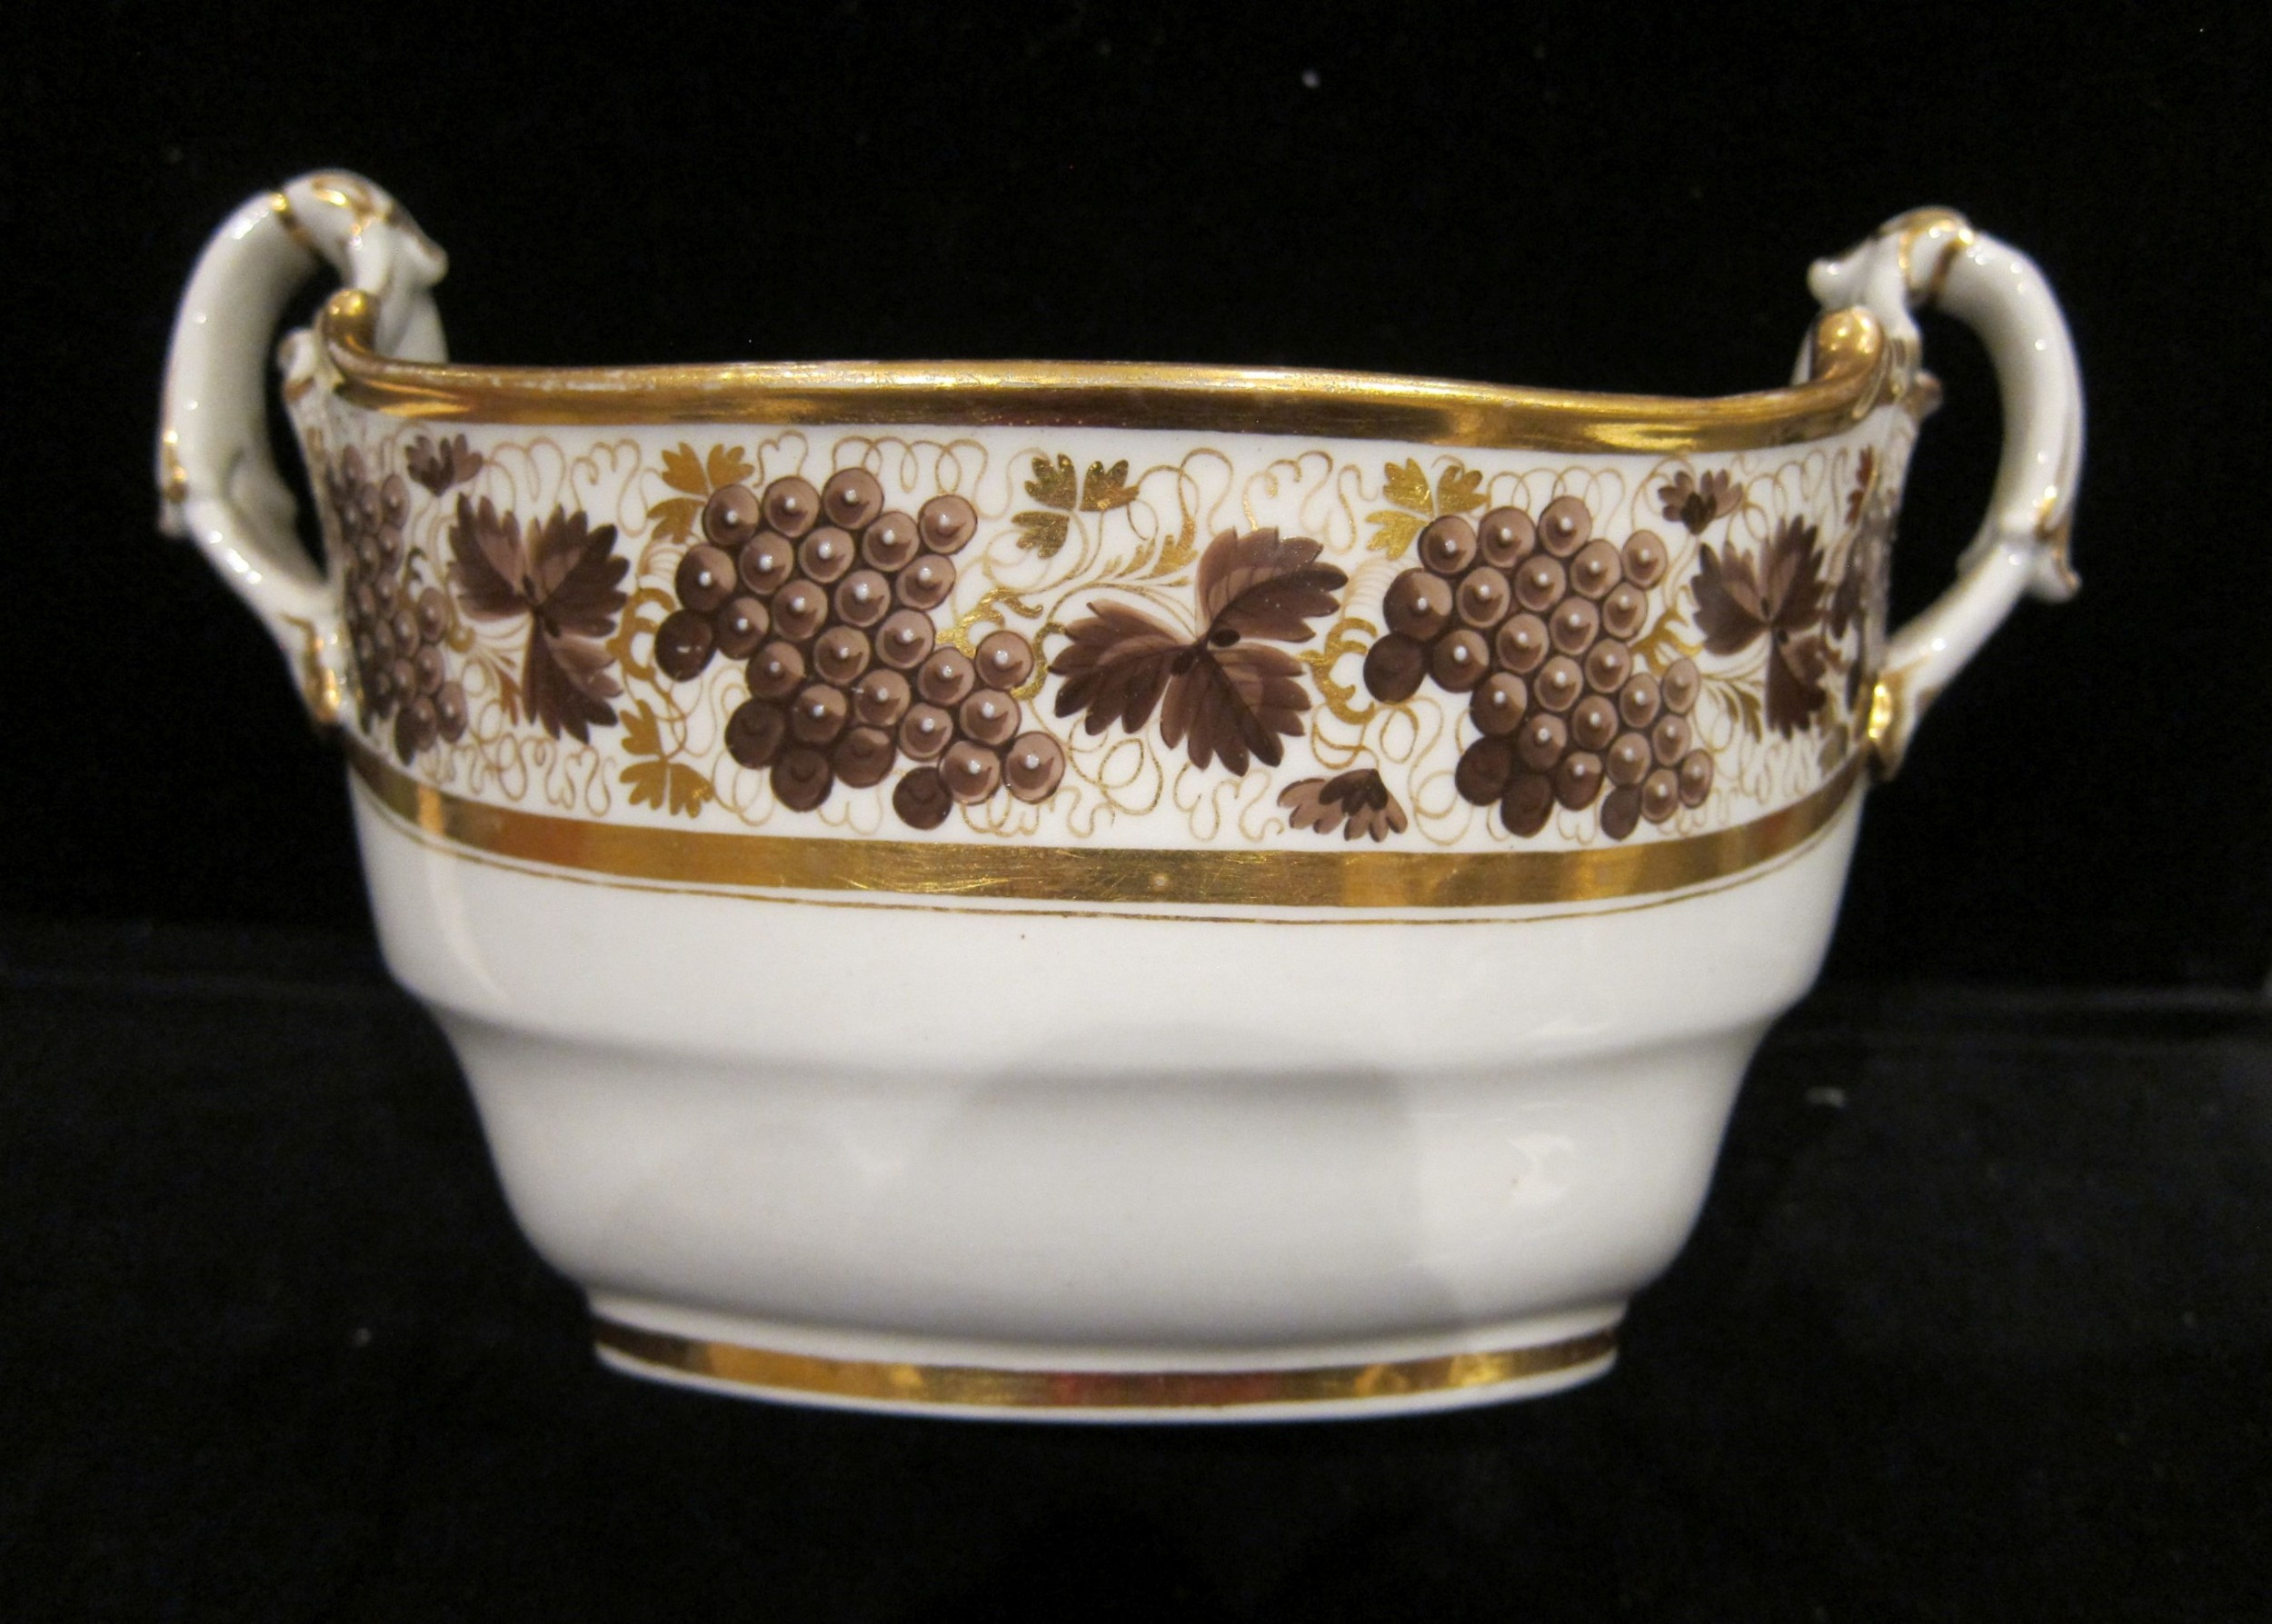 worcester porcelain 2 handled sugar basket decorated with brown grapes